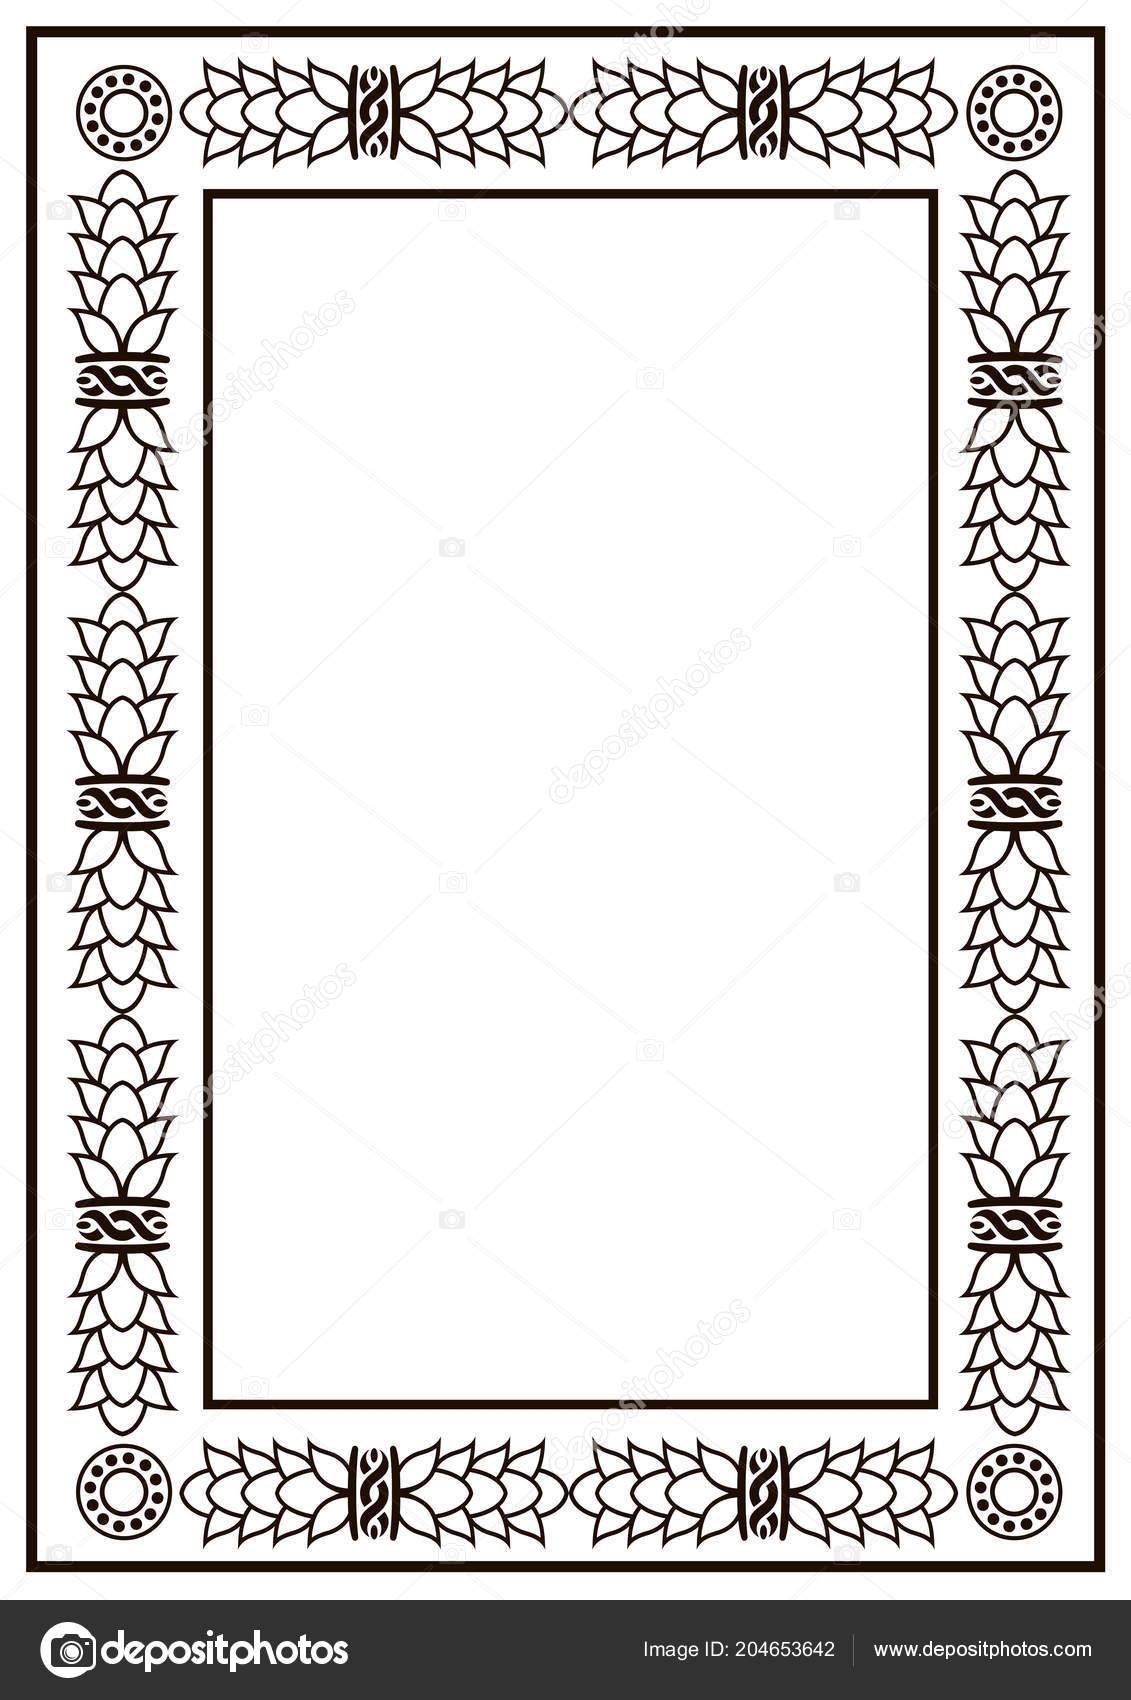 Frame Border Design Template Black White Decorative Vector Border